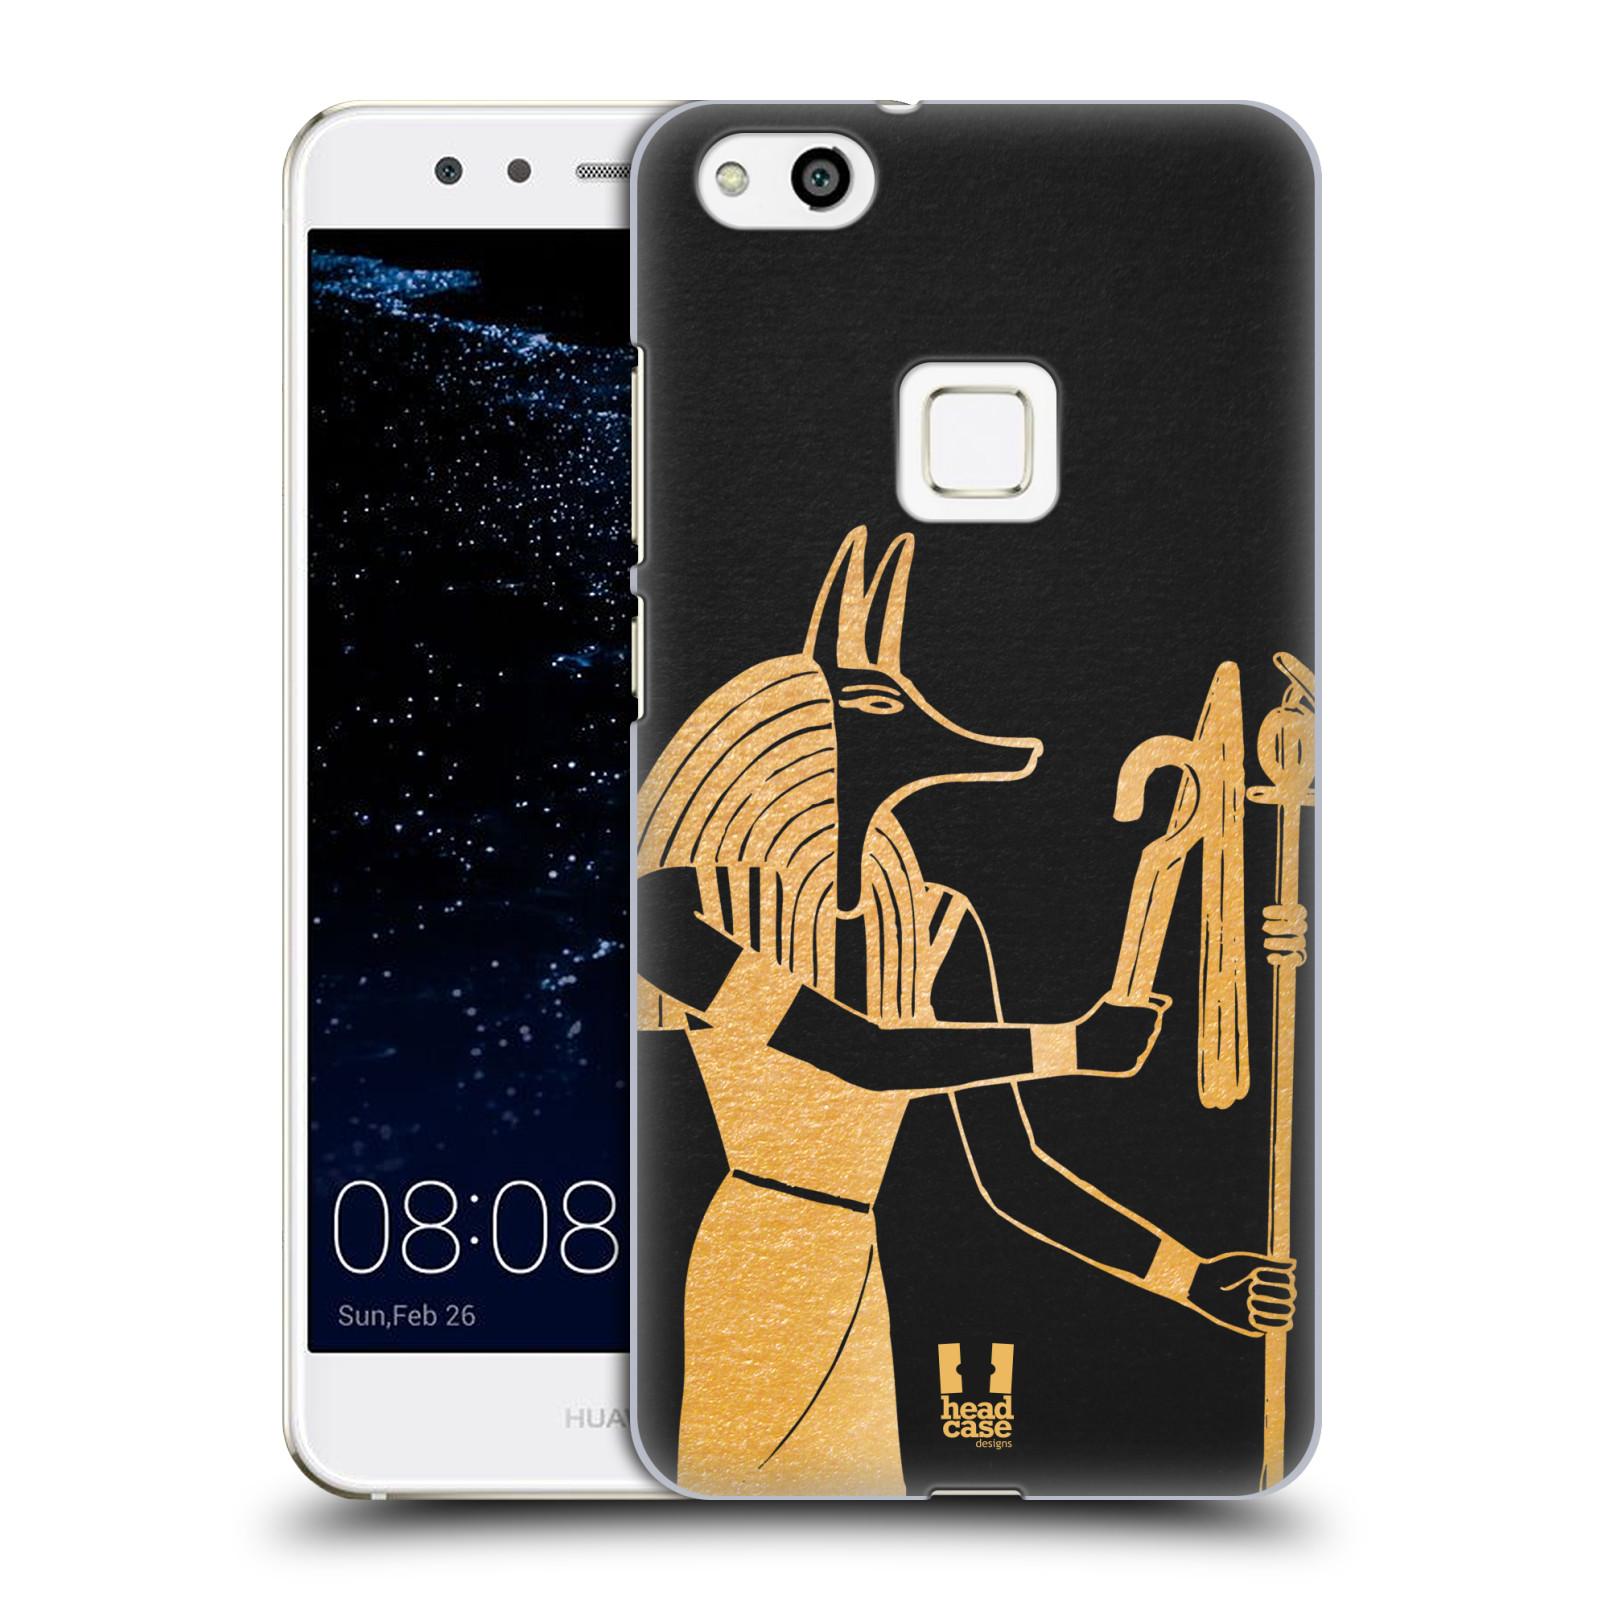 Plastové pouzdro na mobil Huawei P10 Lite Head Case - EGYPT ANUBIS (Plastový kryt či obal na mobilní telefon Huawei P10 Lite Dual SIM (LX1/LX1A))